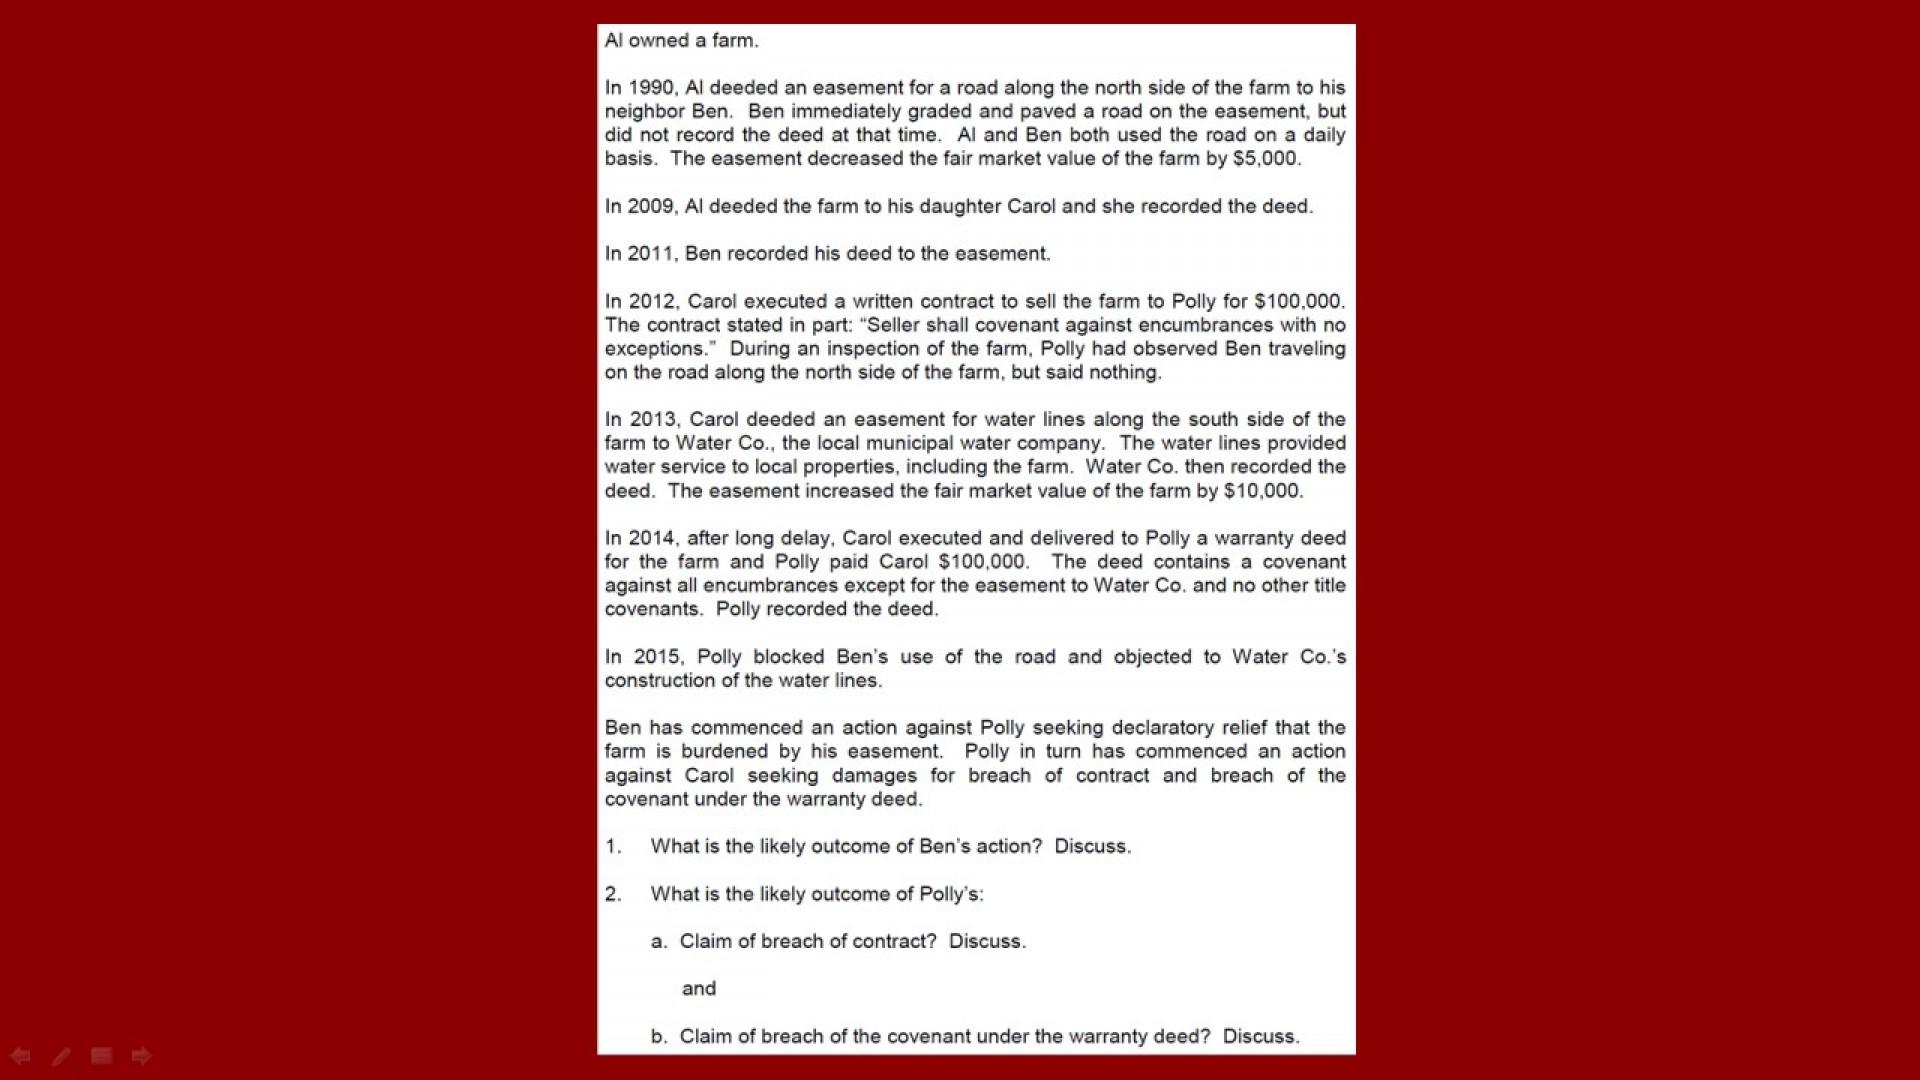 014 California Bar Essays Essay Example Marvelous Exam Graded February 2018 How Are 1920